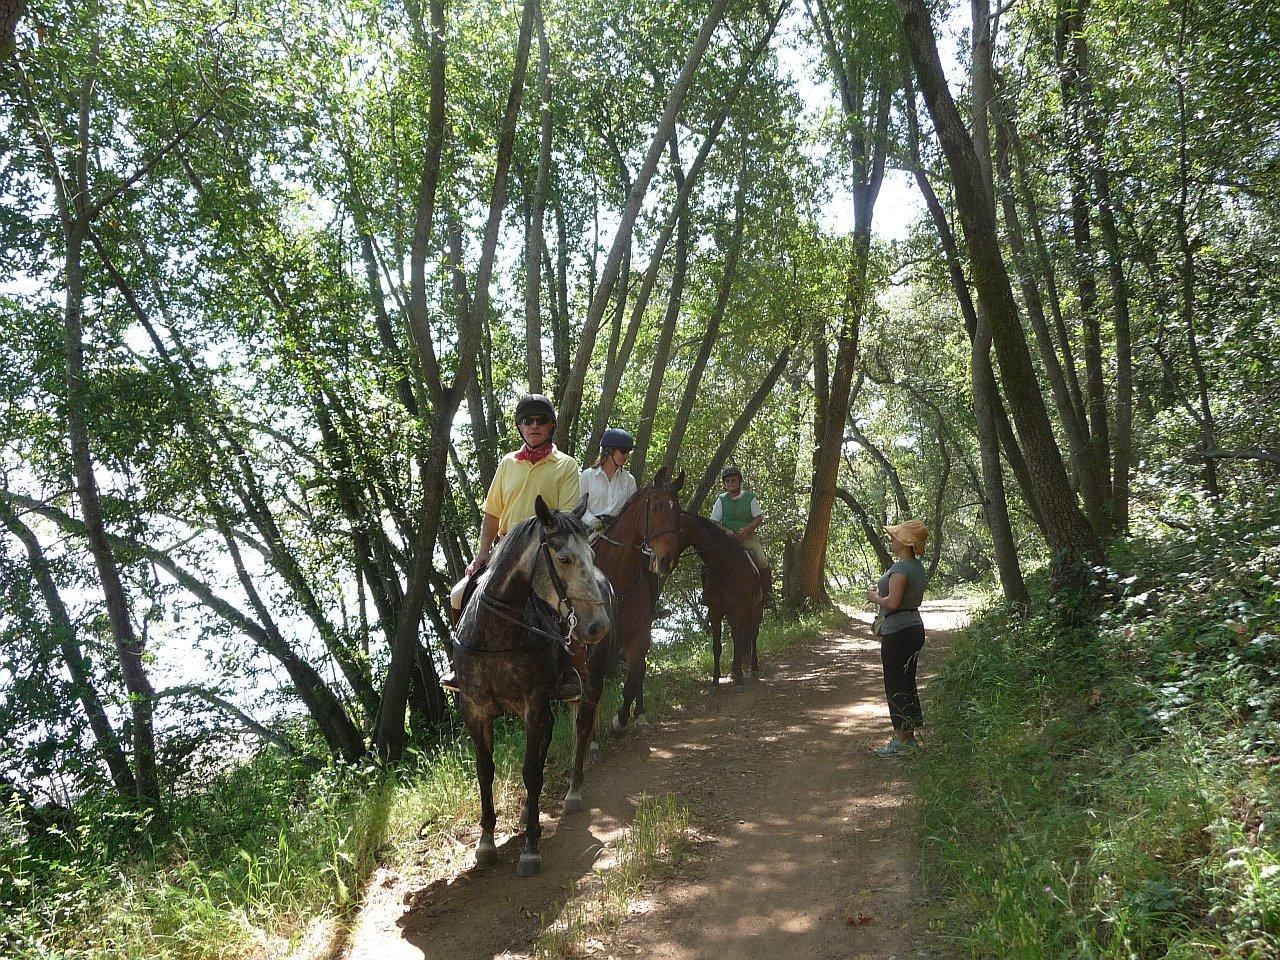 Rush creek horse hiker stop 1280 webop.jpg